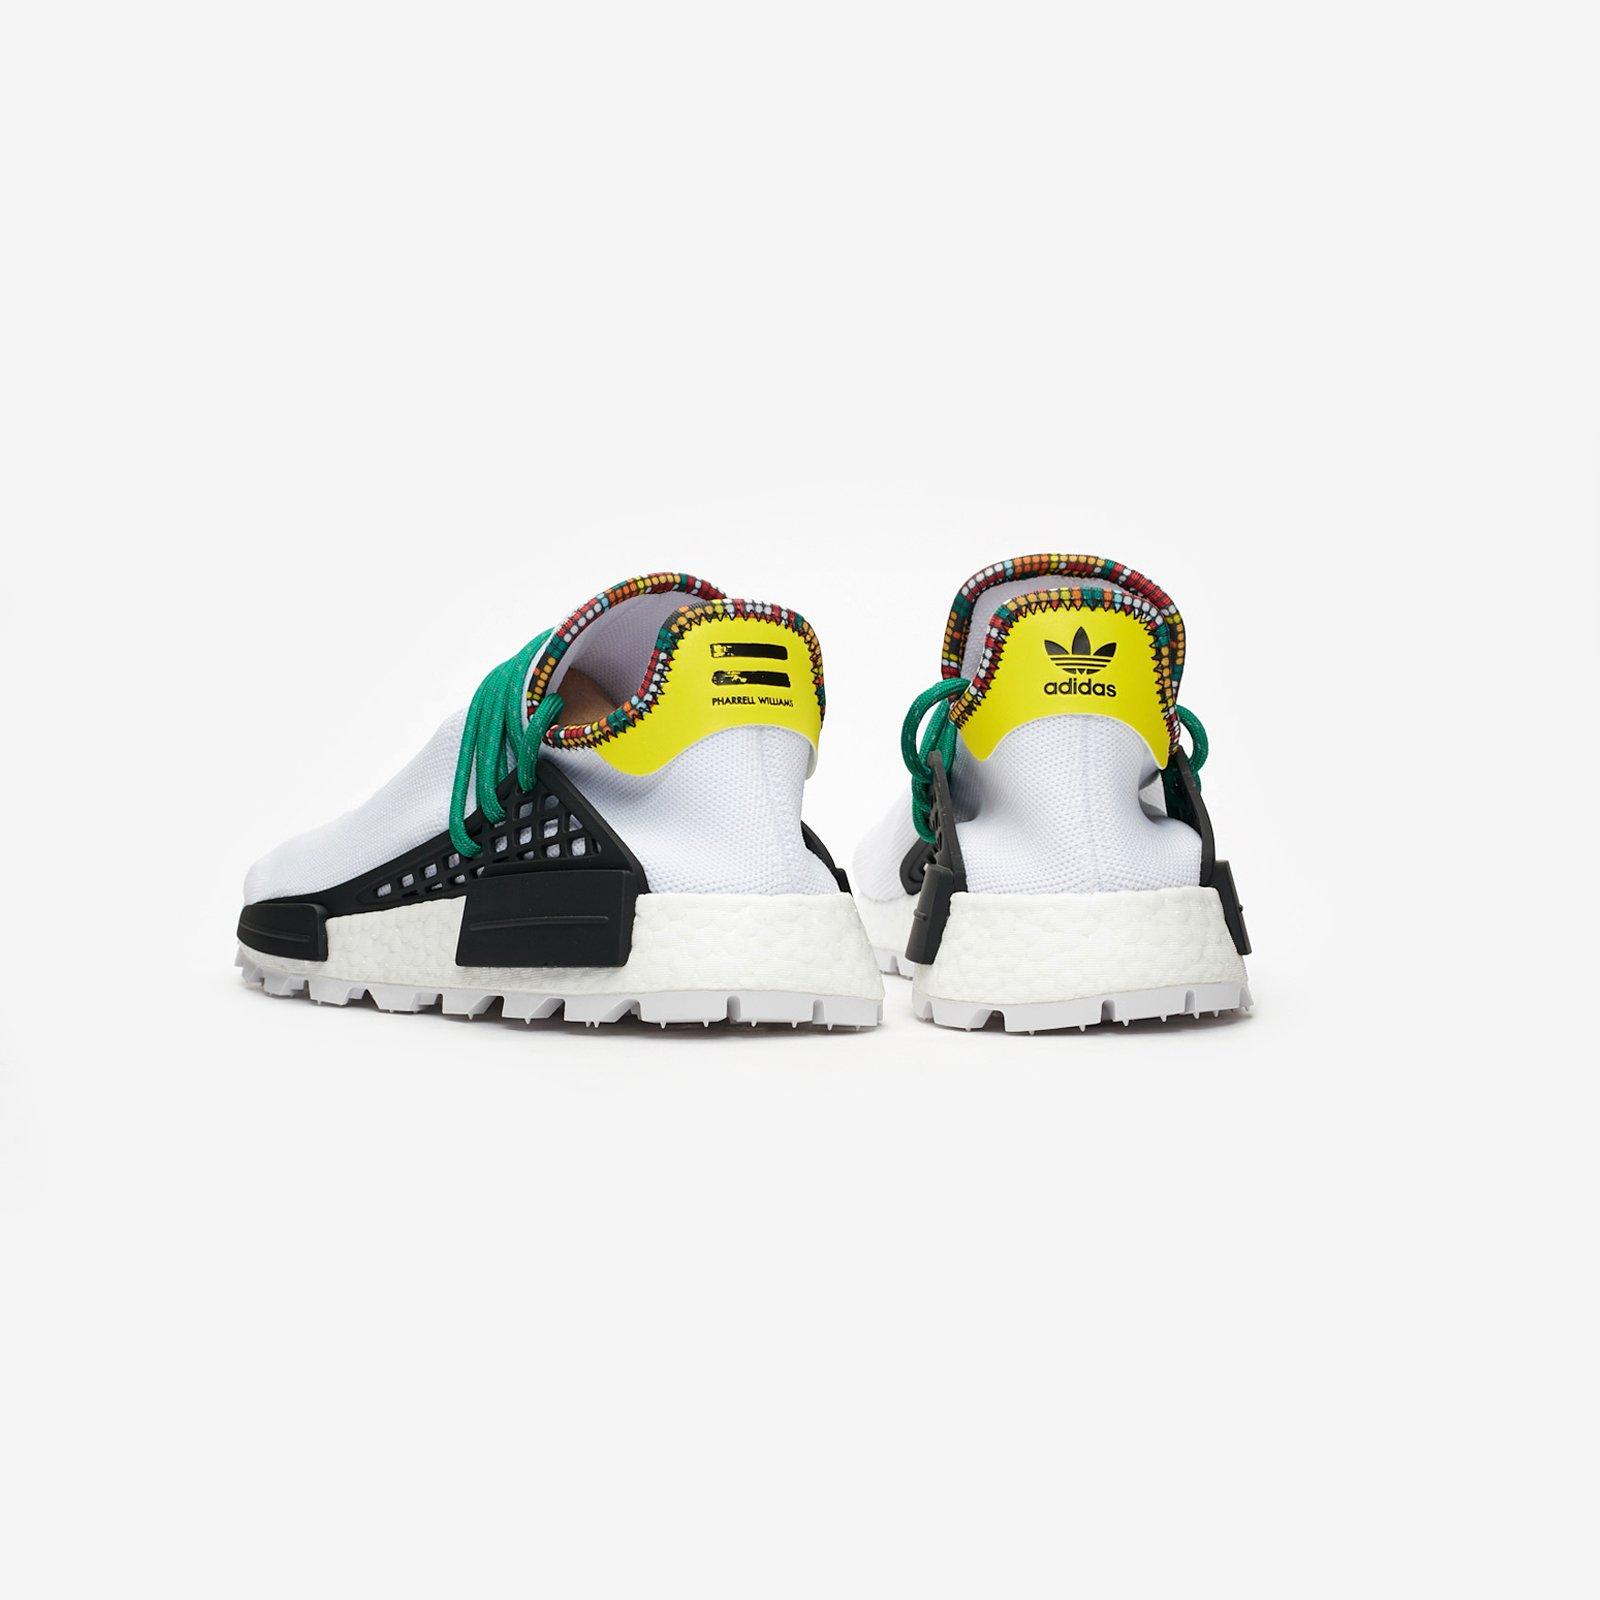 finest selection b34f4 b7c97 ... adidas by Pharrell Williams PW HU NMD ...